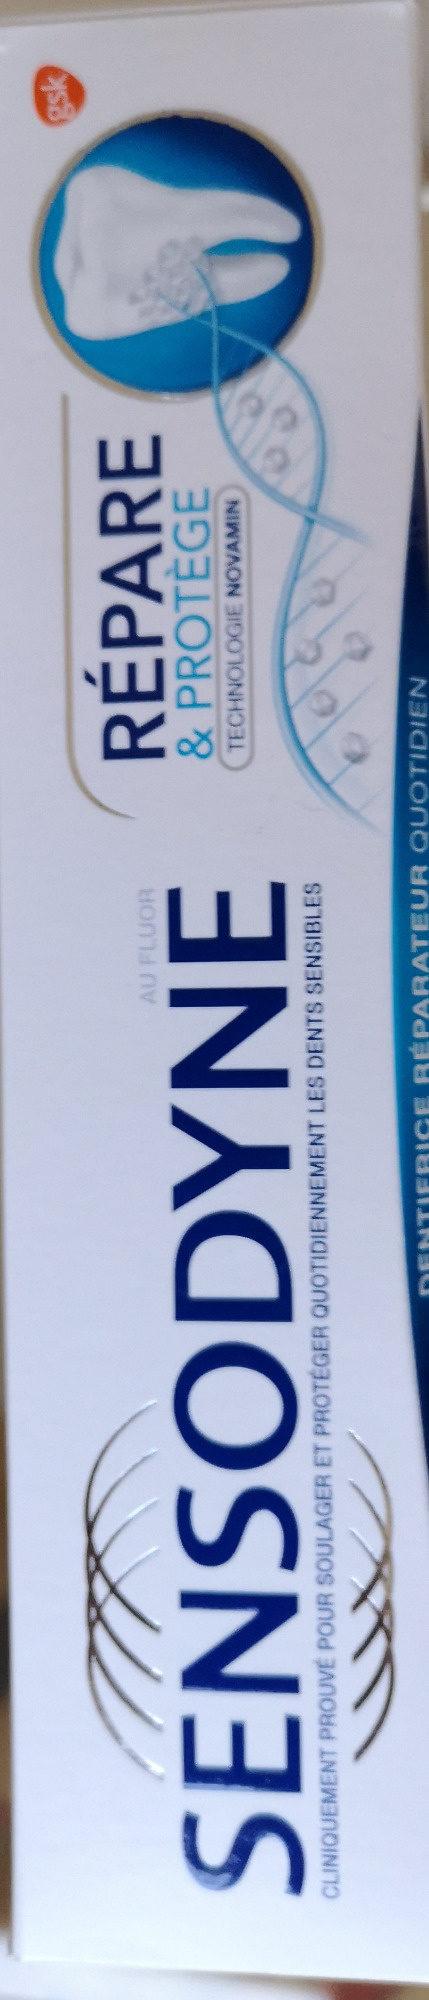 Dentifrice multiprotection - Produit - fr